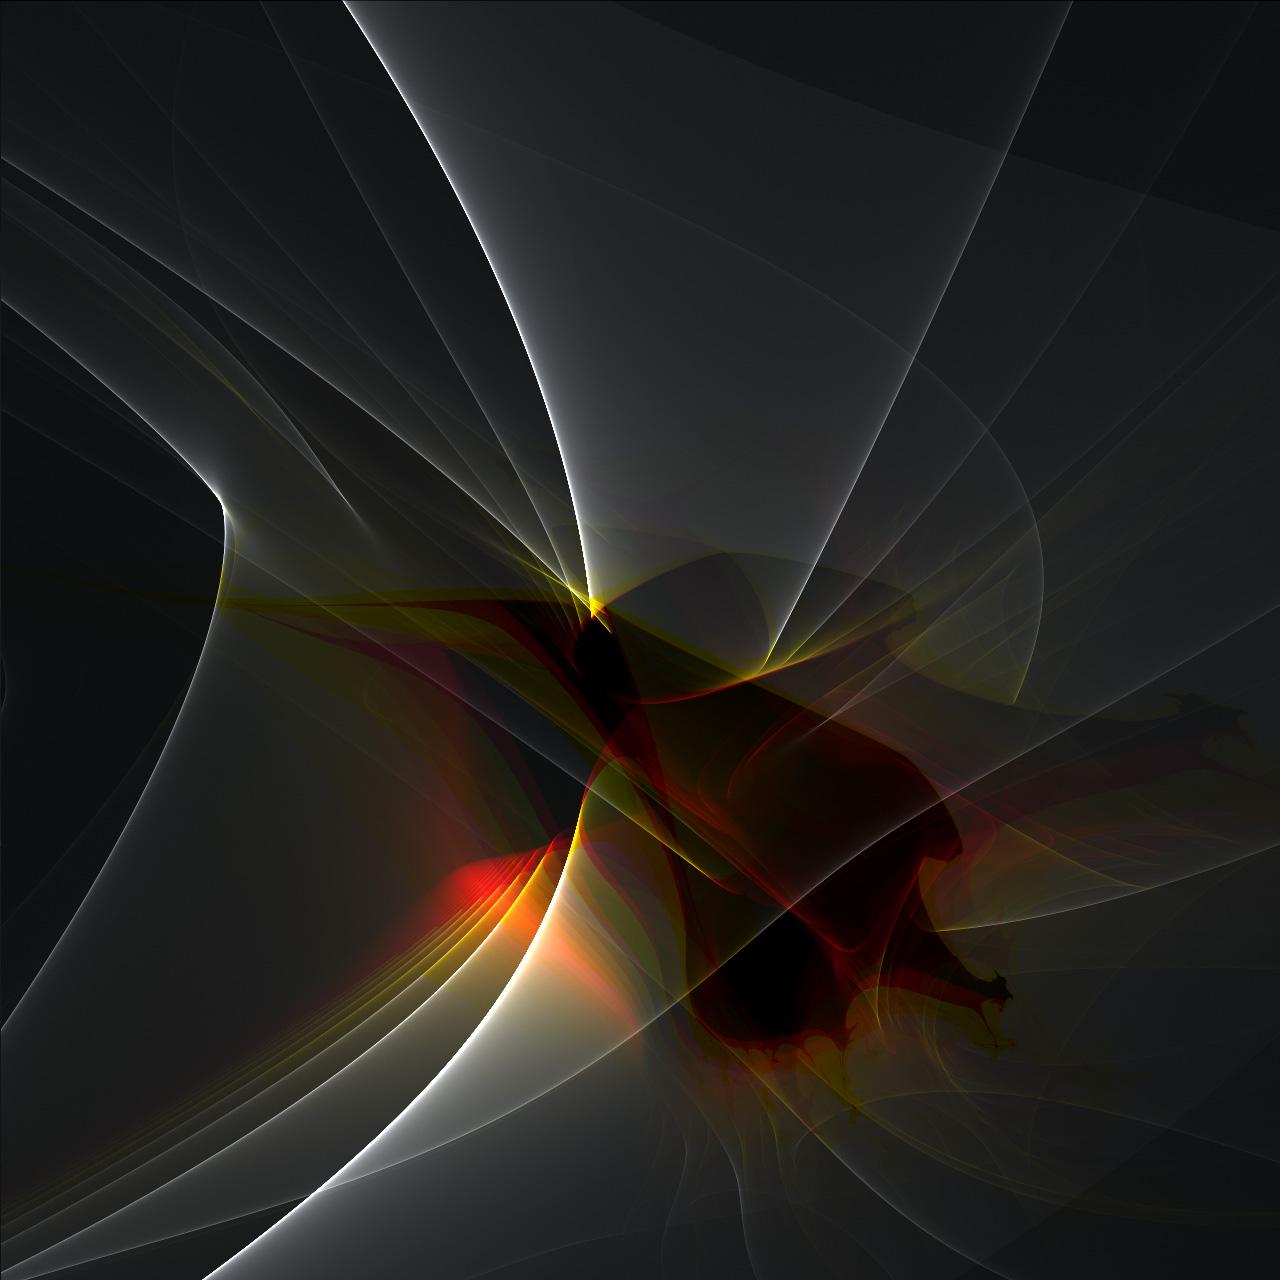 software_buddhabrot_image11